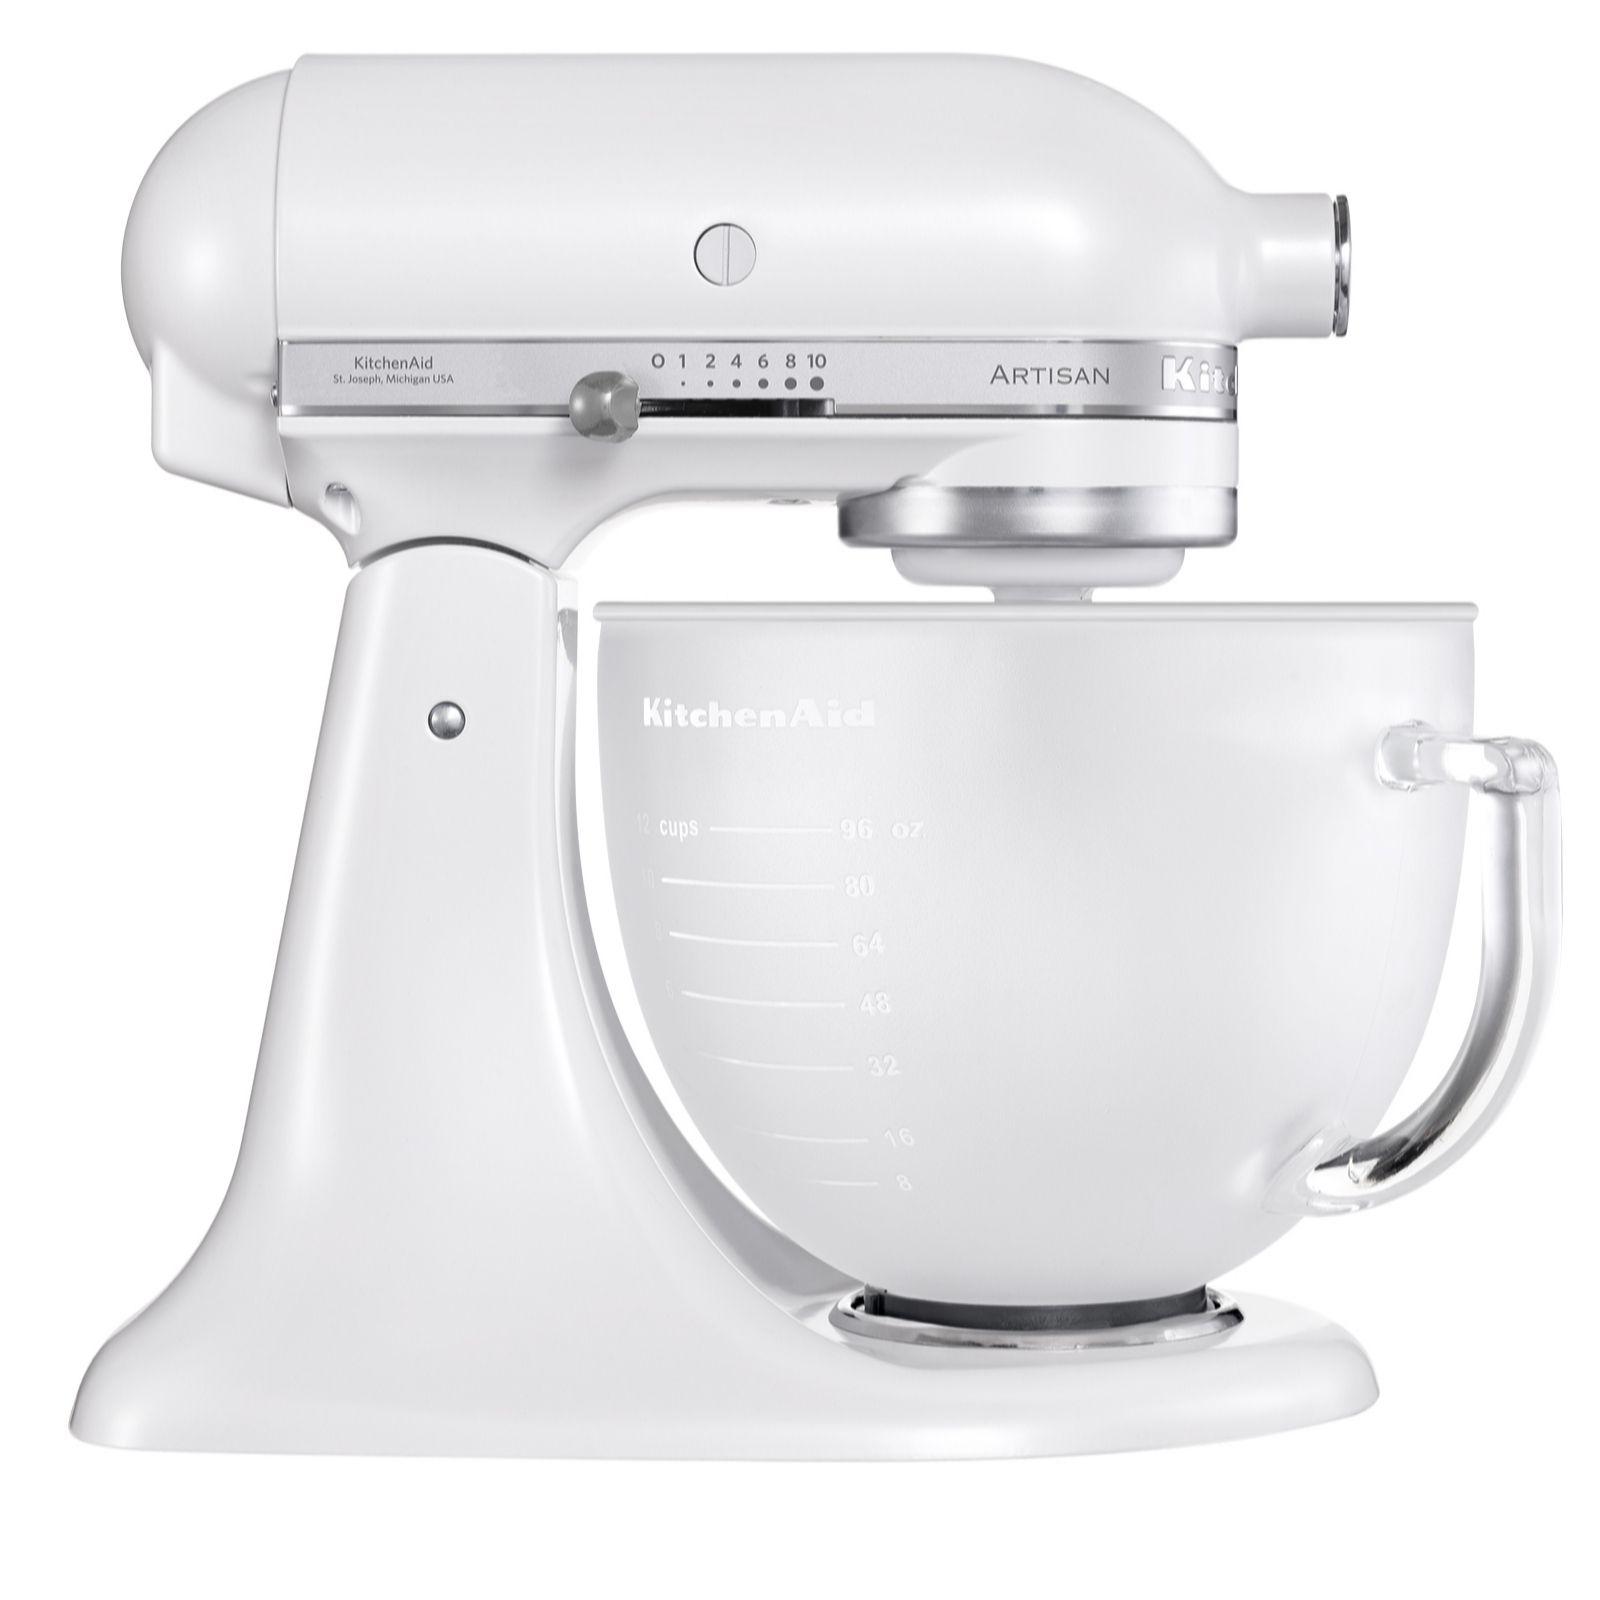 kitchenaid 175 artisan 4 8l stand mixer. kitchenaid artisan stand mixer with stainless steel bowl - 800339 kitchenaid 175 4 8l m